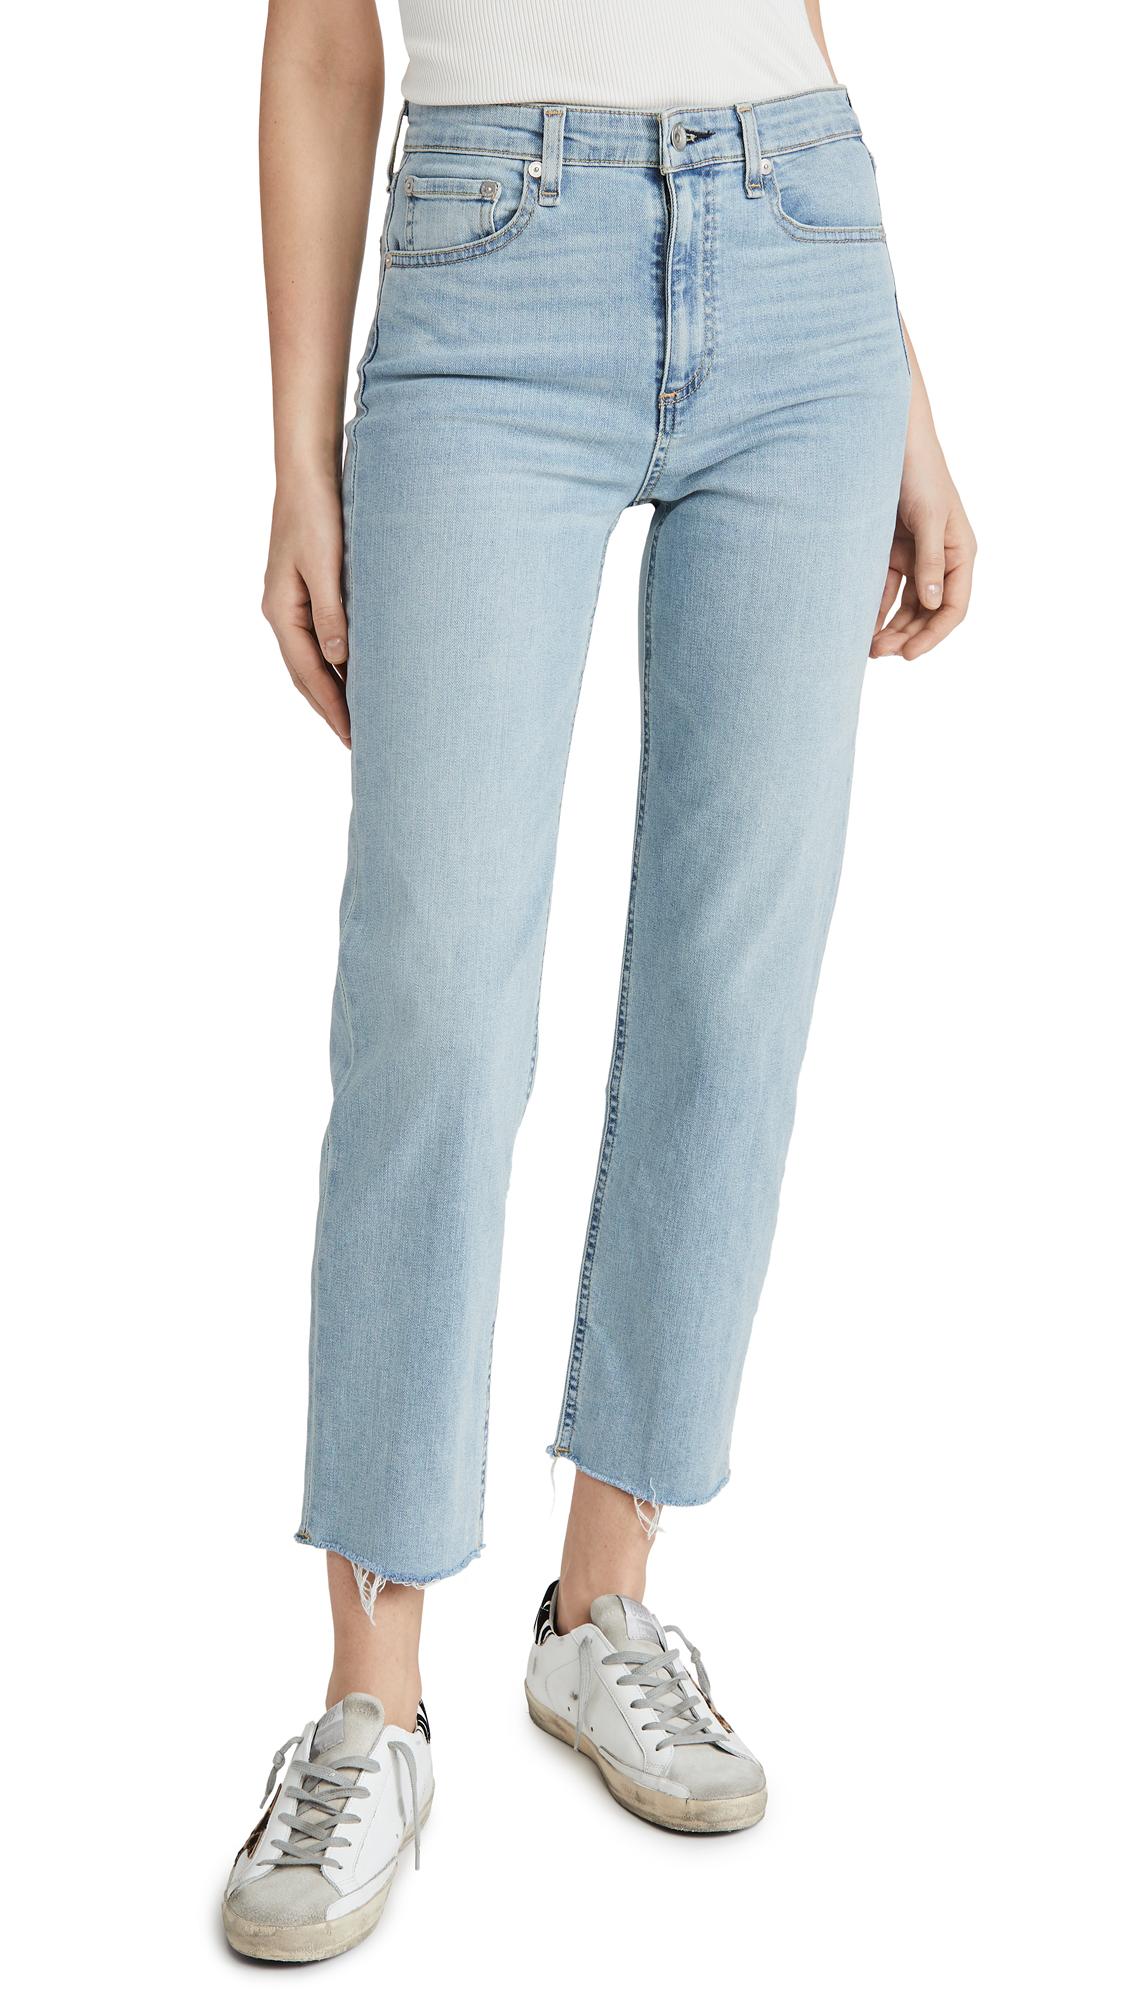 Buy Rag & Bone/JEAN online - photo of Rag & Bone/JEAN Nina High Rise Ankle Cigarette Jeans